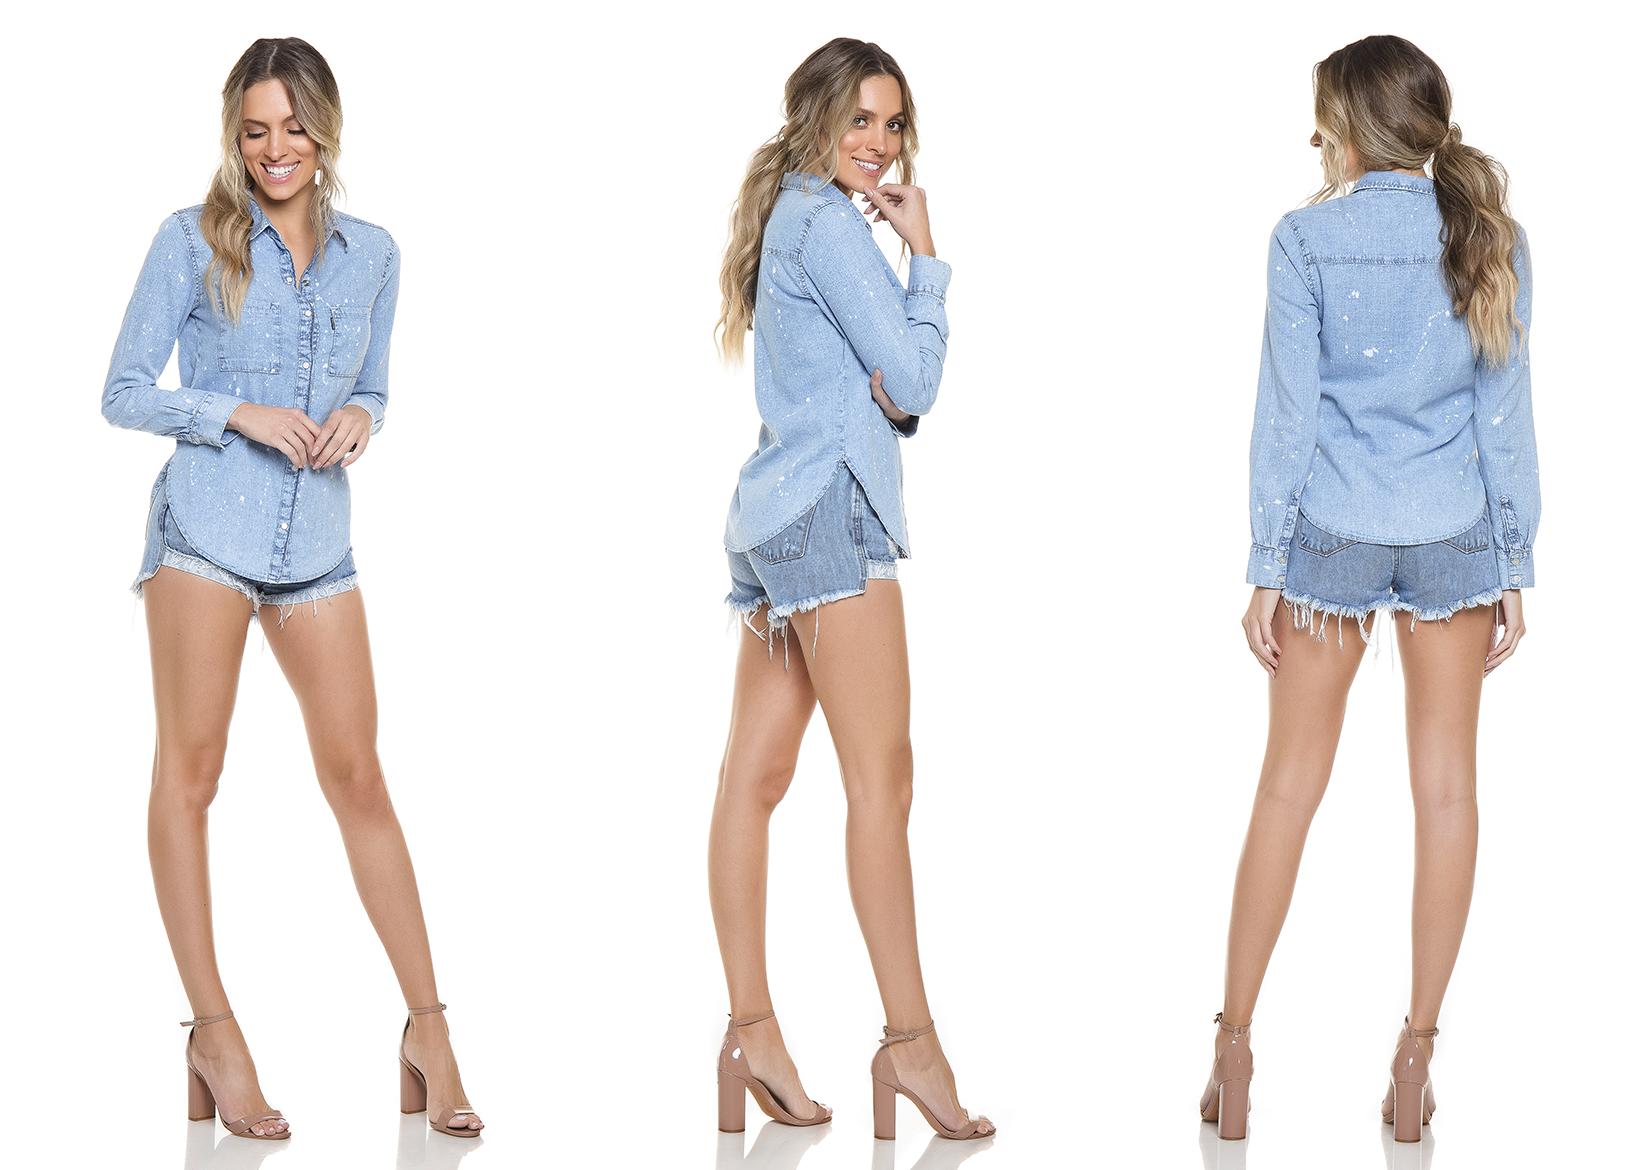 dz11129 camisa jeans solta tripla denim zero